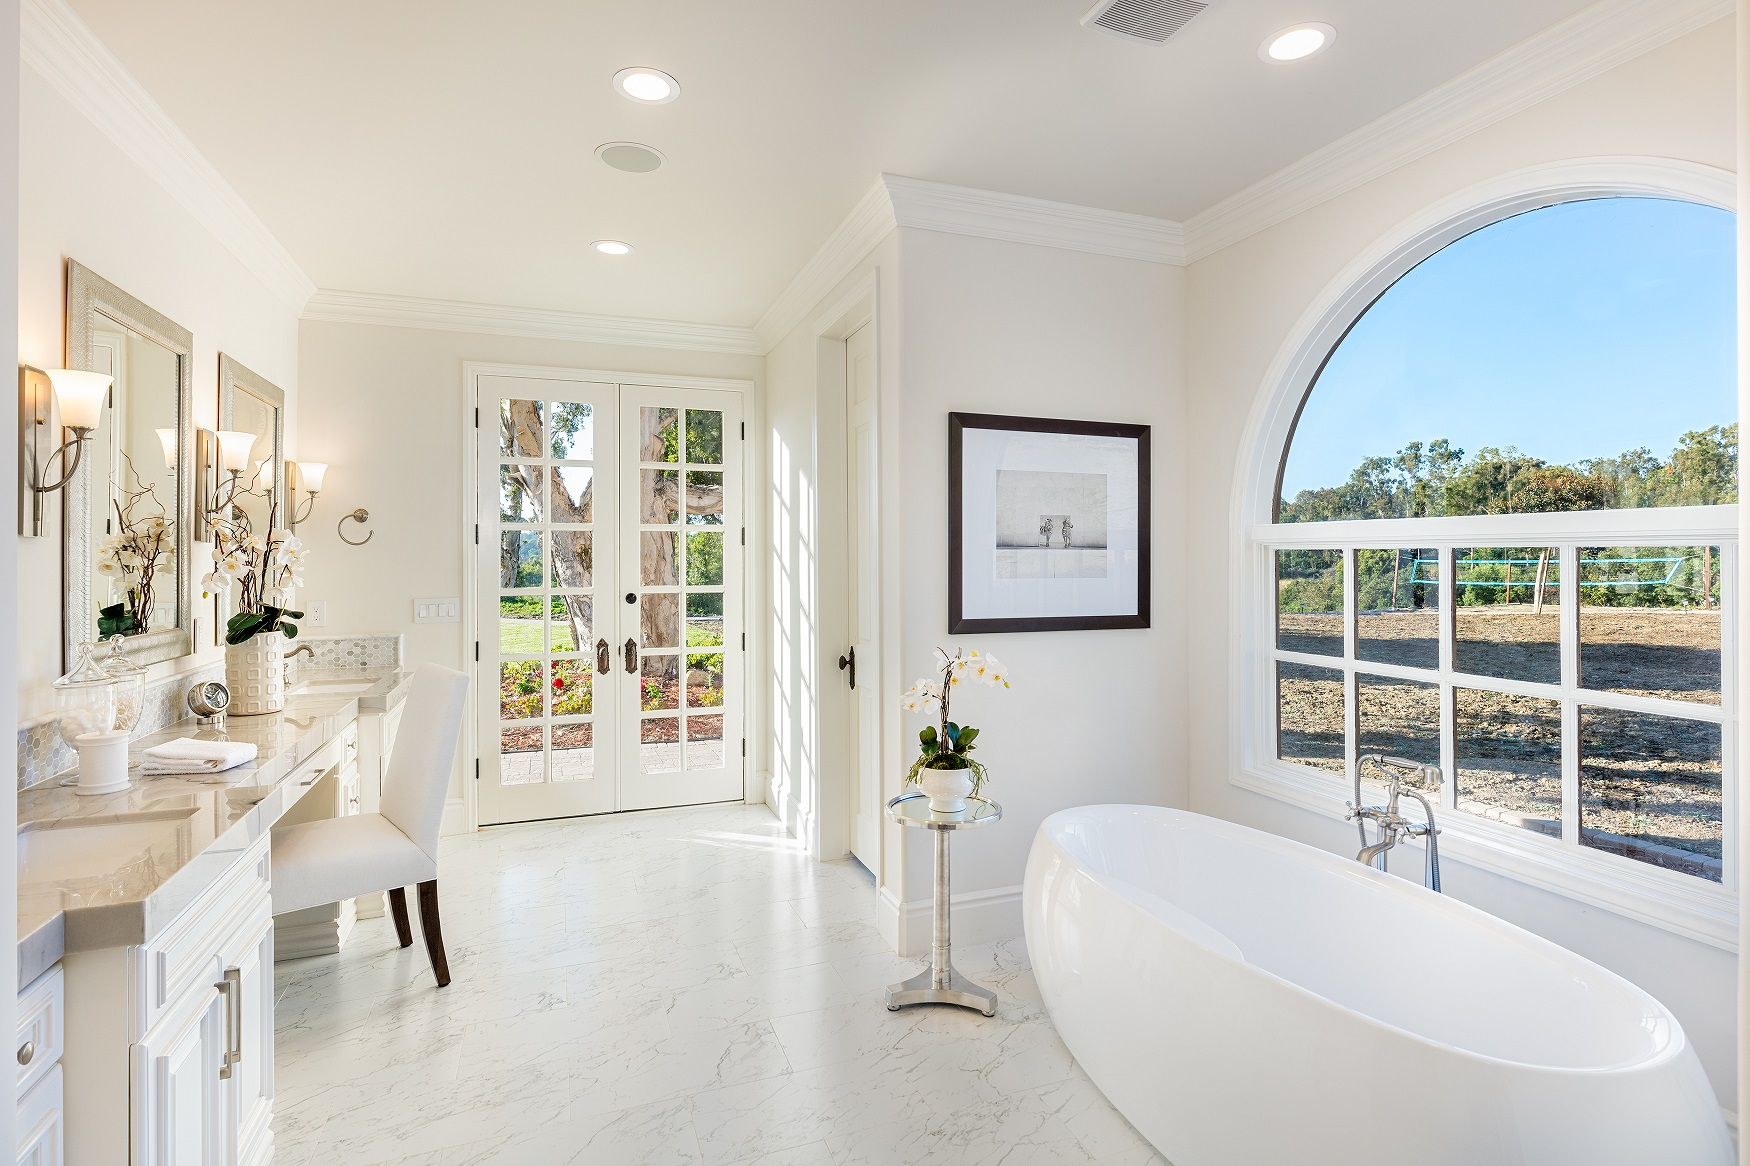 Sold 2017 Represented Buyer & Seller -  Rancho Santa Fe, CA 92067